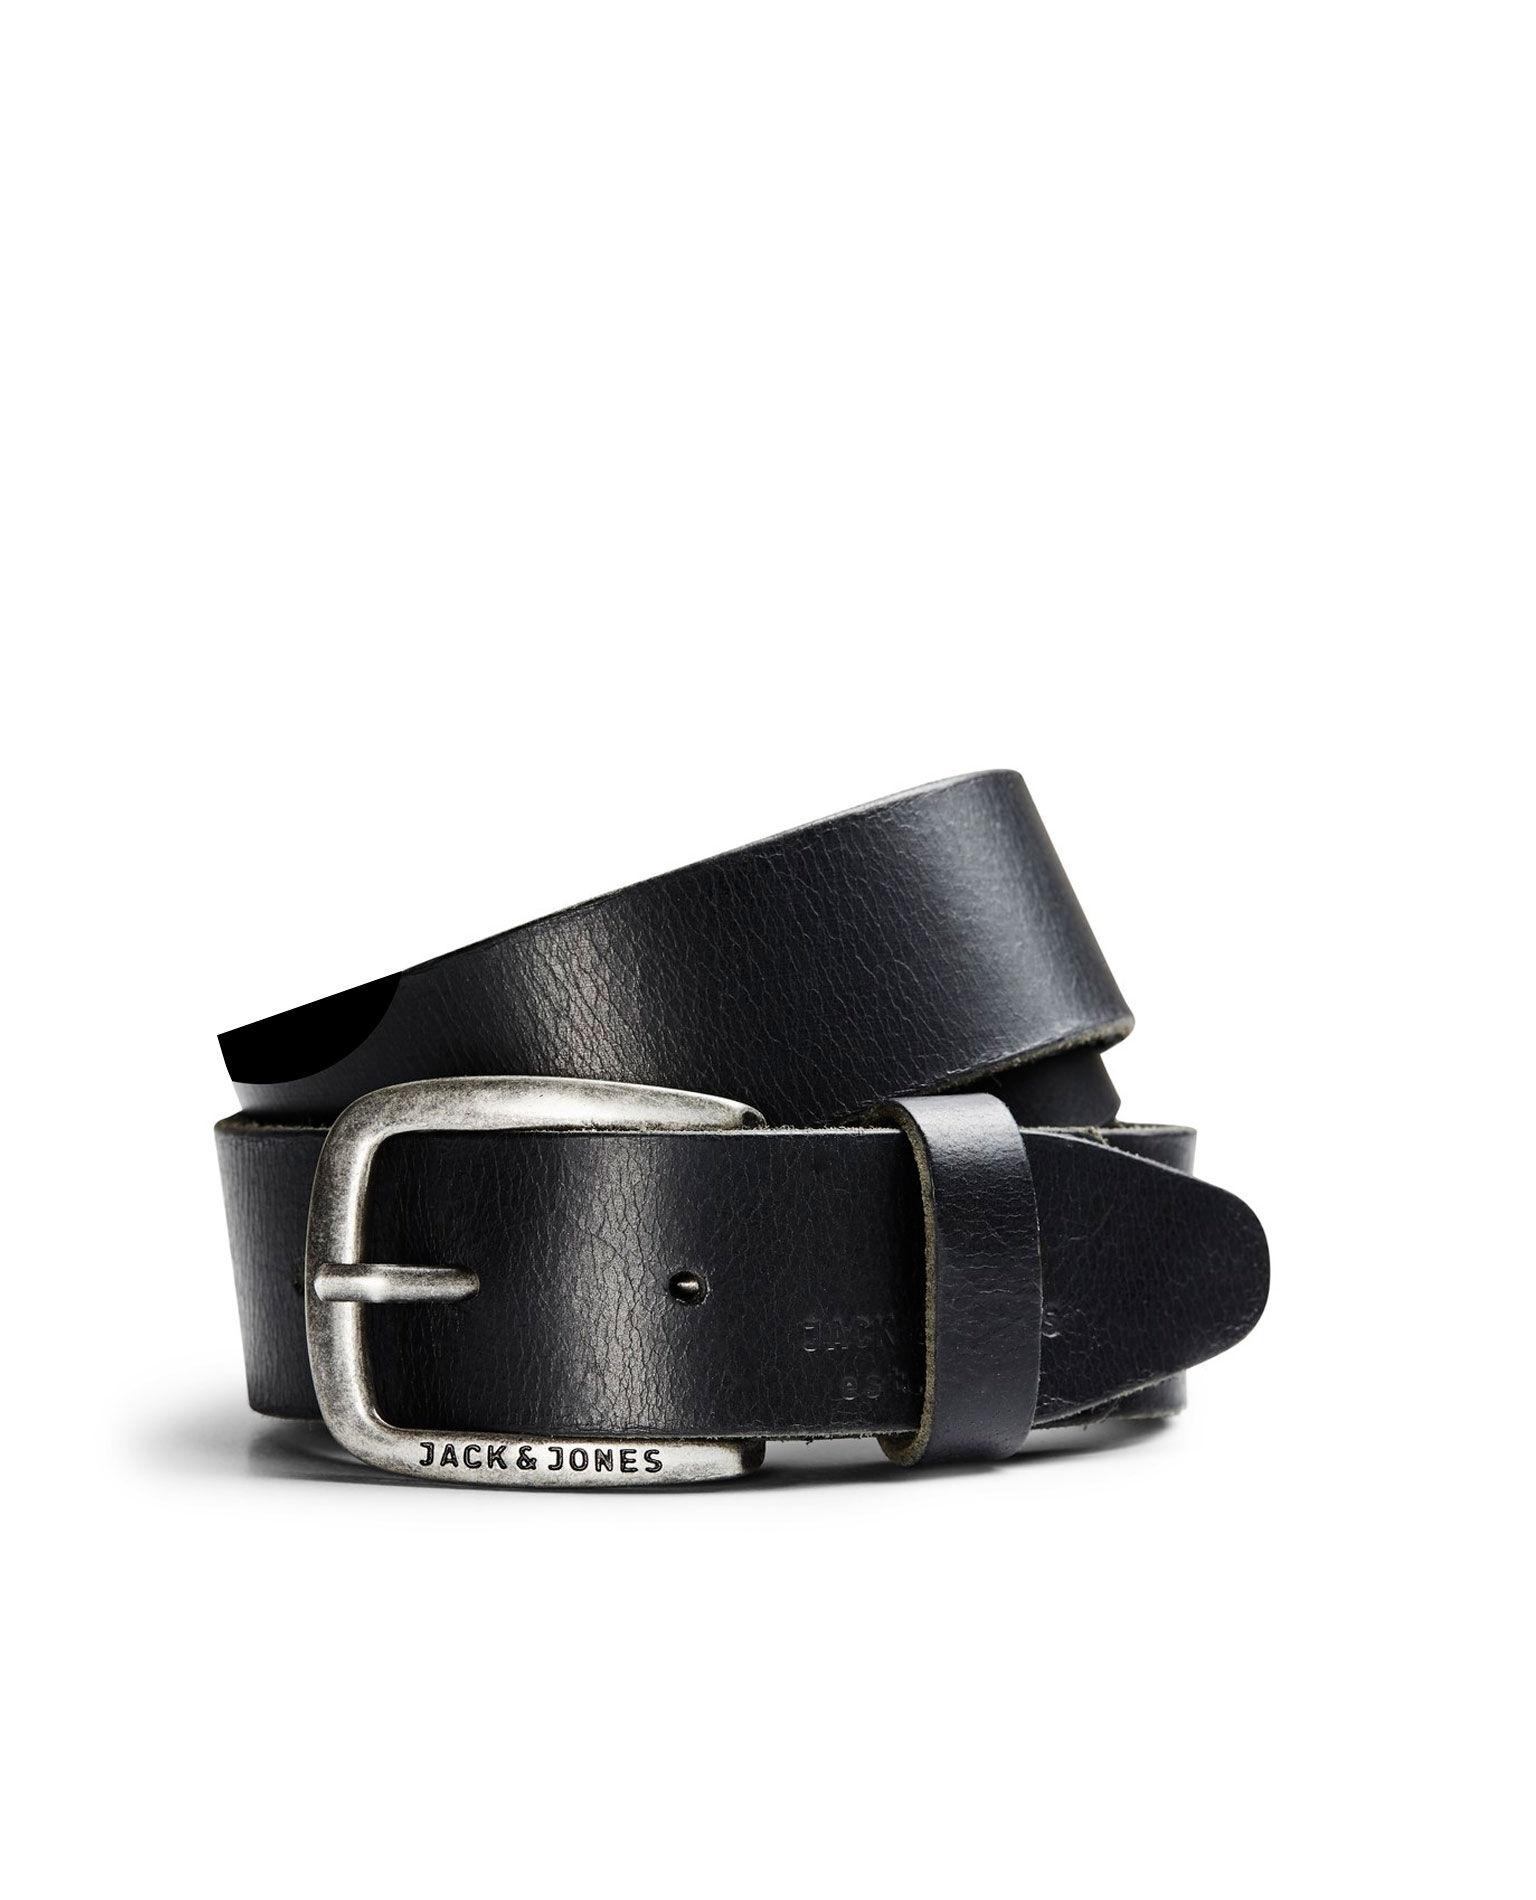 Paul Leather Belt Black Jack & Jones